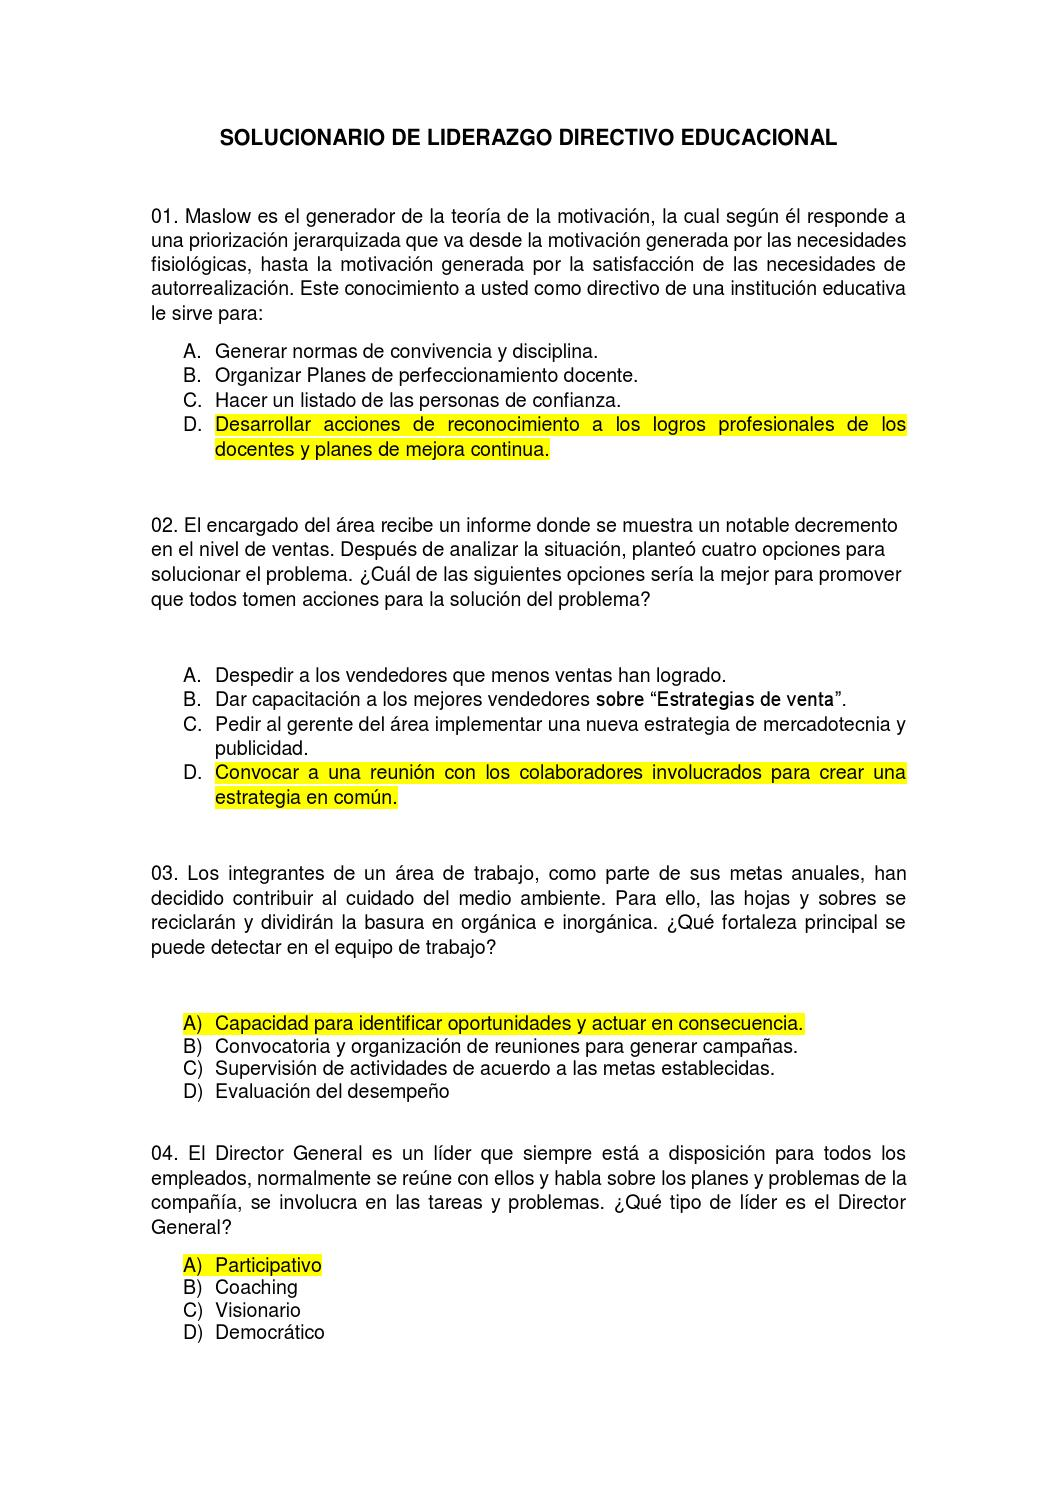 Liderazgo directivo educacional by CARLOS - issuu